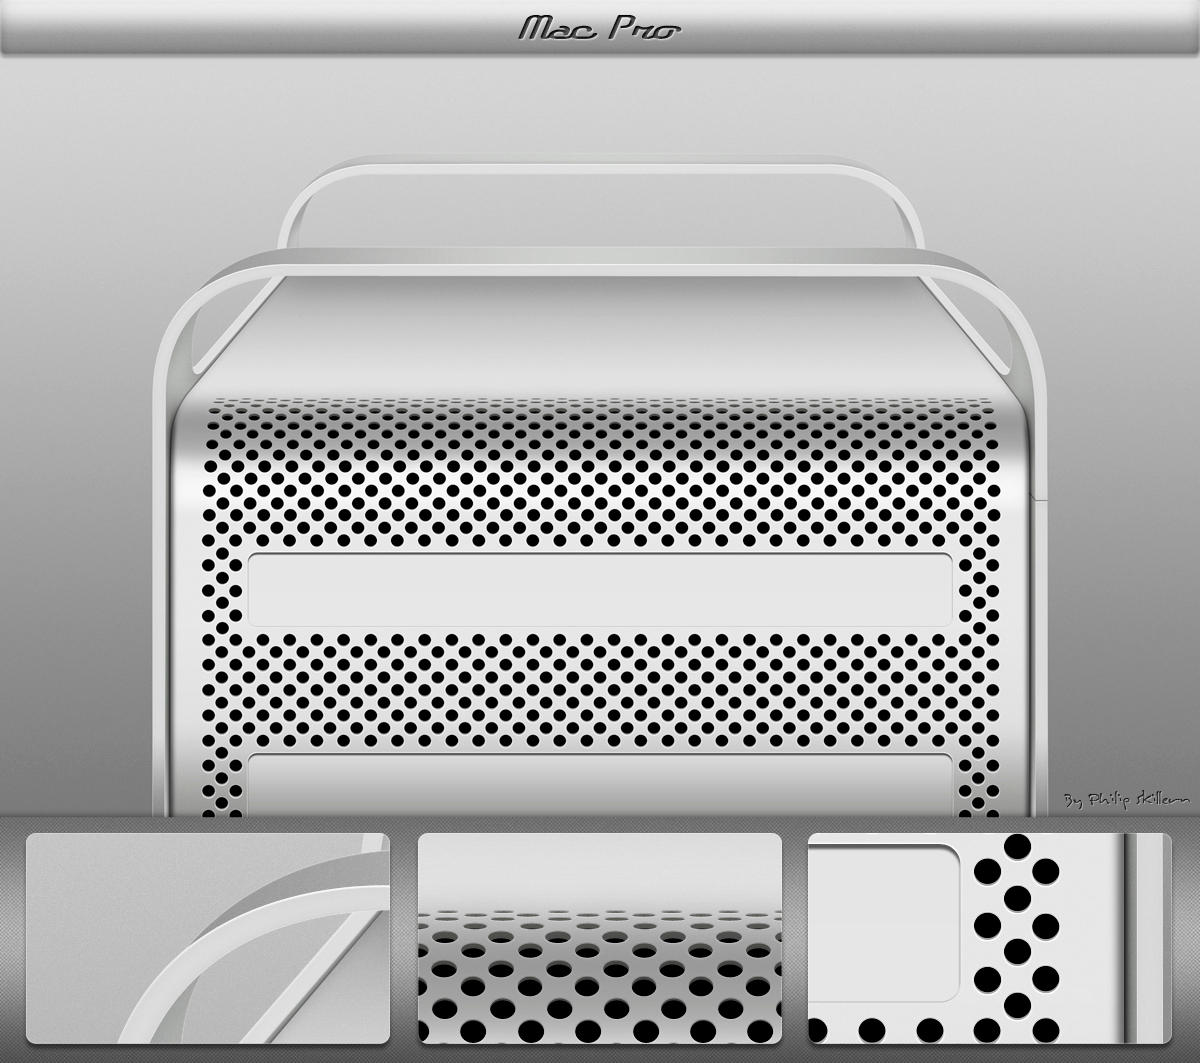 Mac Pro by philipskillern